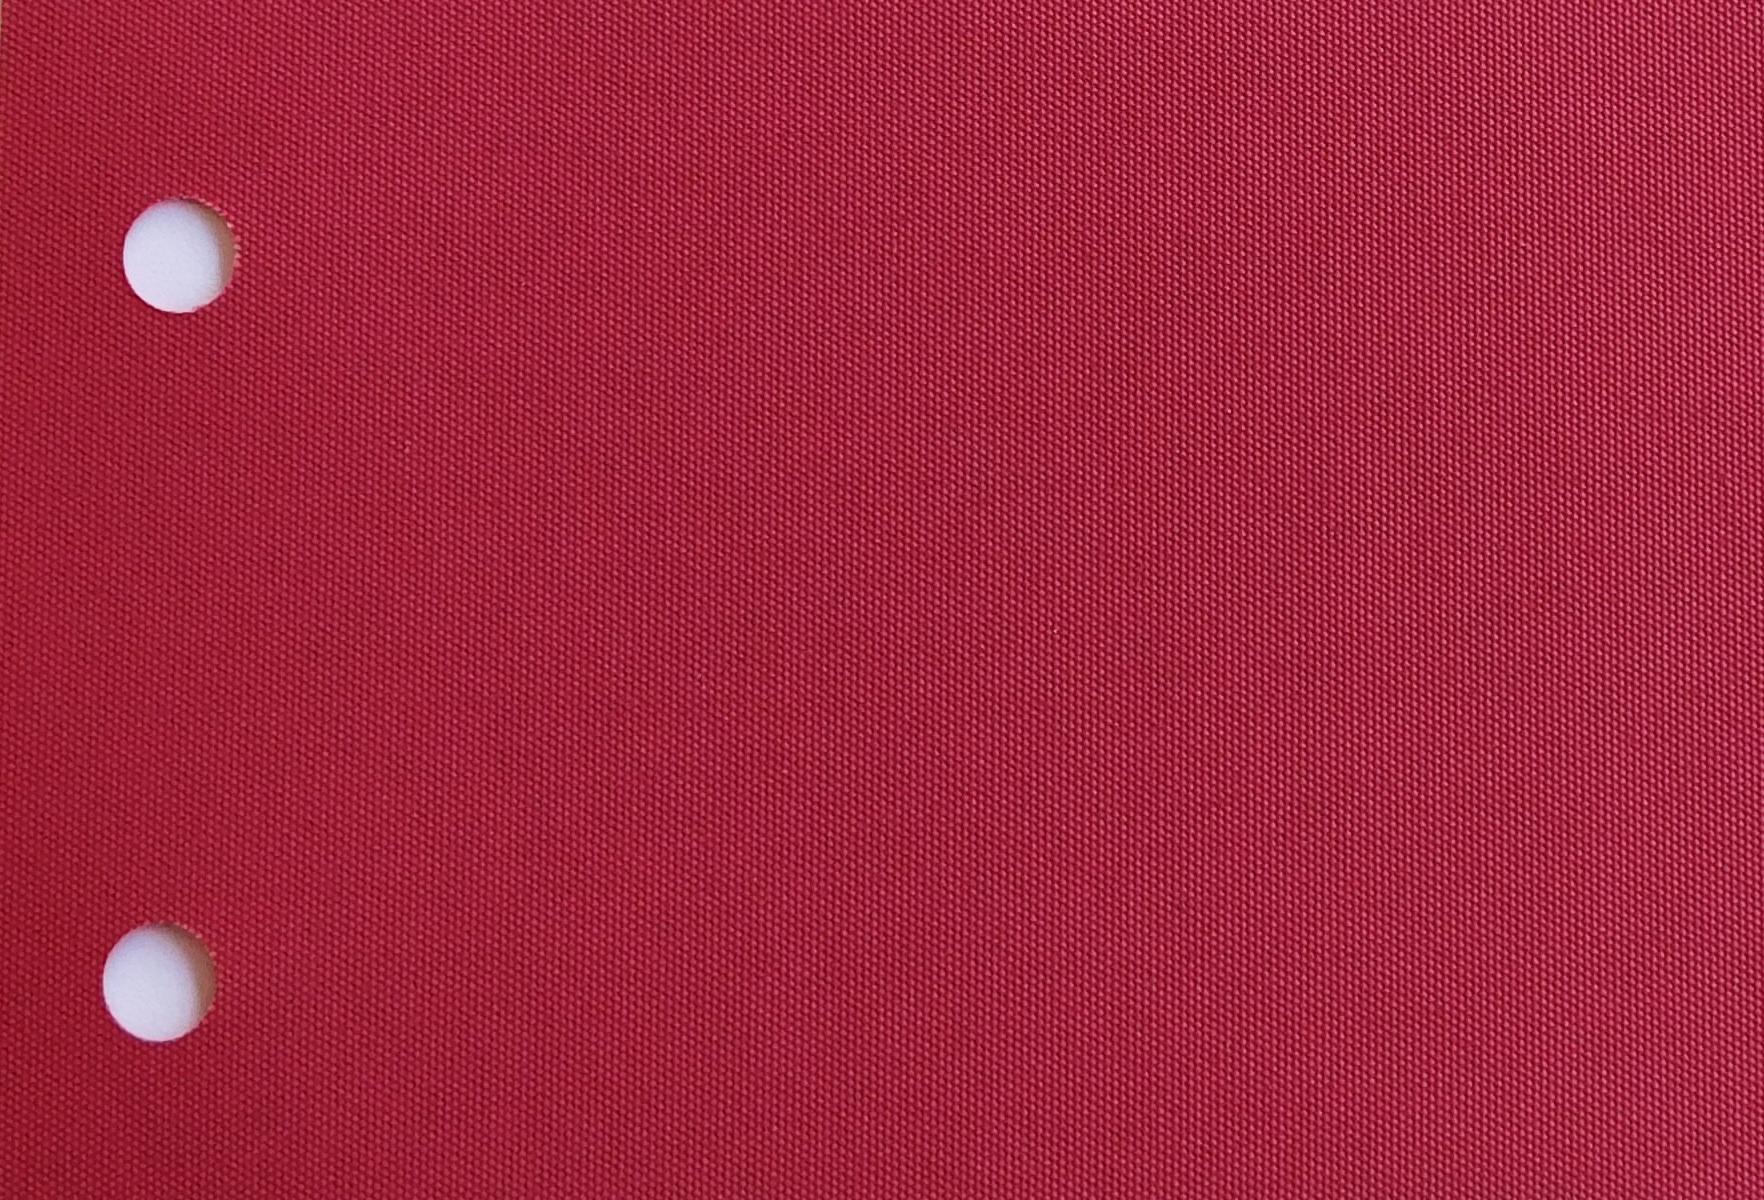 Carnival Pomegranate blind fabric